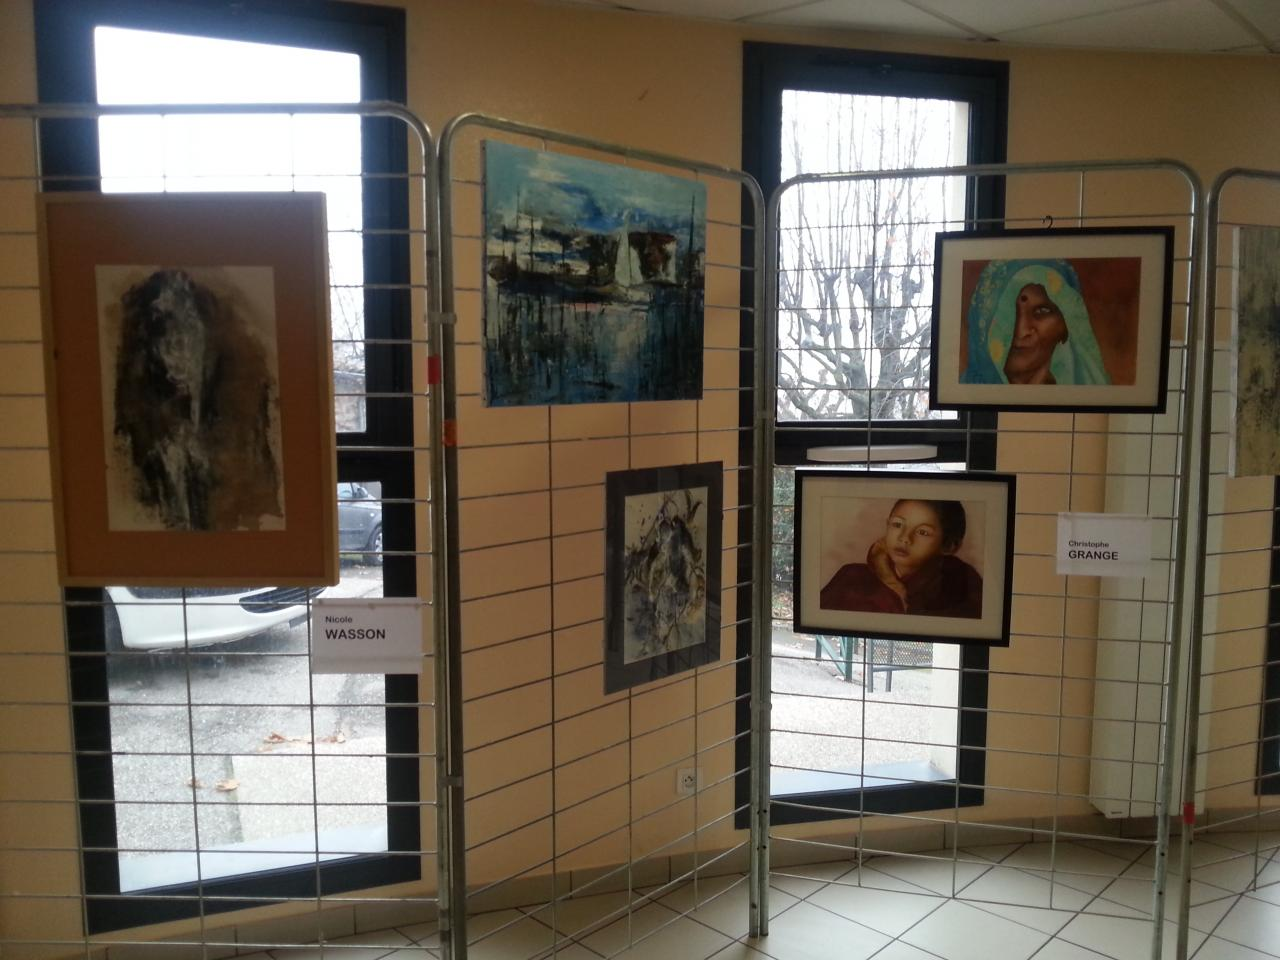 Exposition d'oeuvres d'artistes locaux